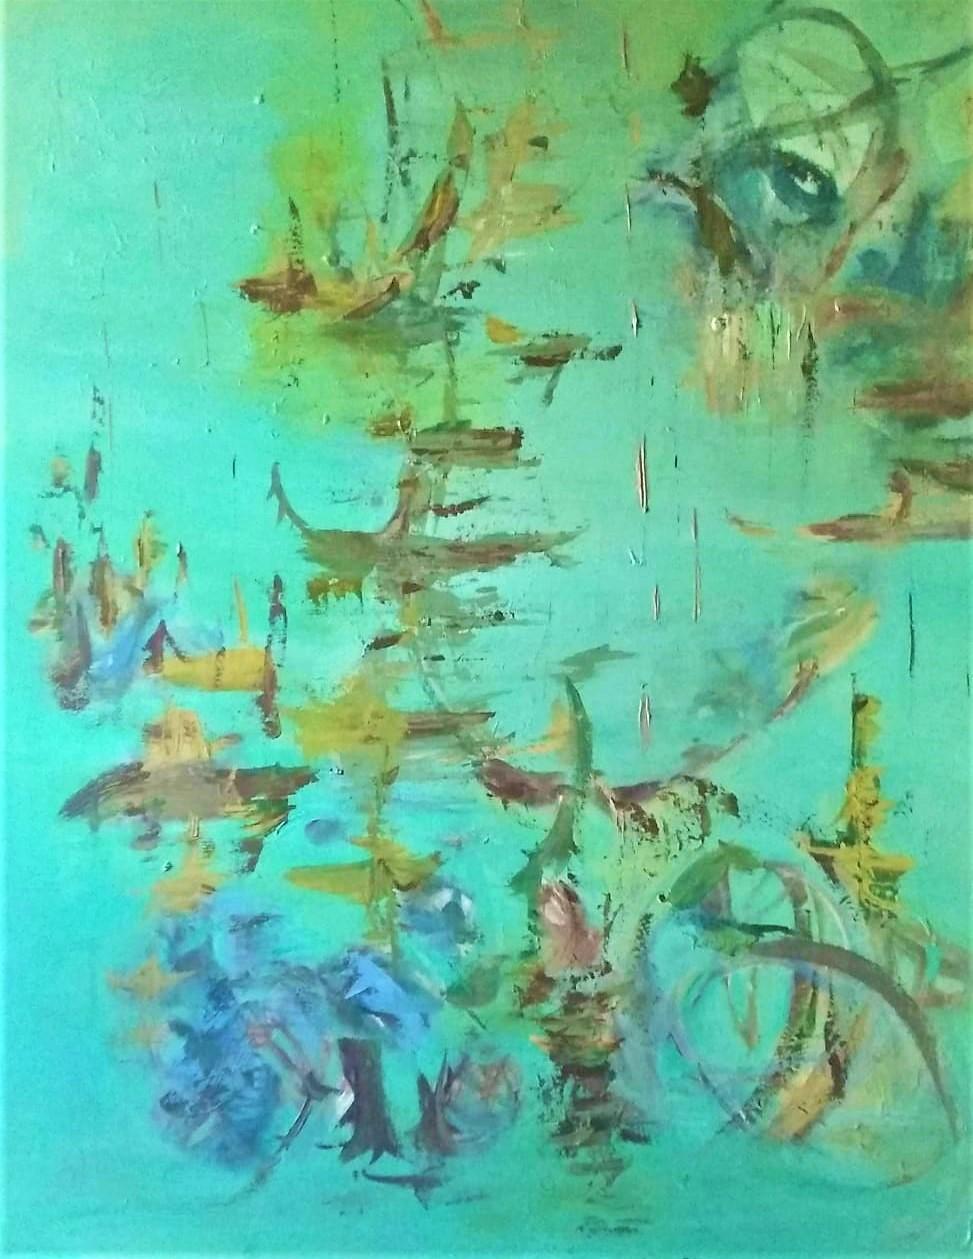 Oriente-Pintura sobre tela- 80 x 100 cm.-2019.